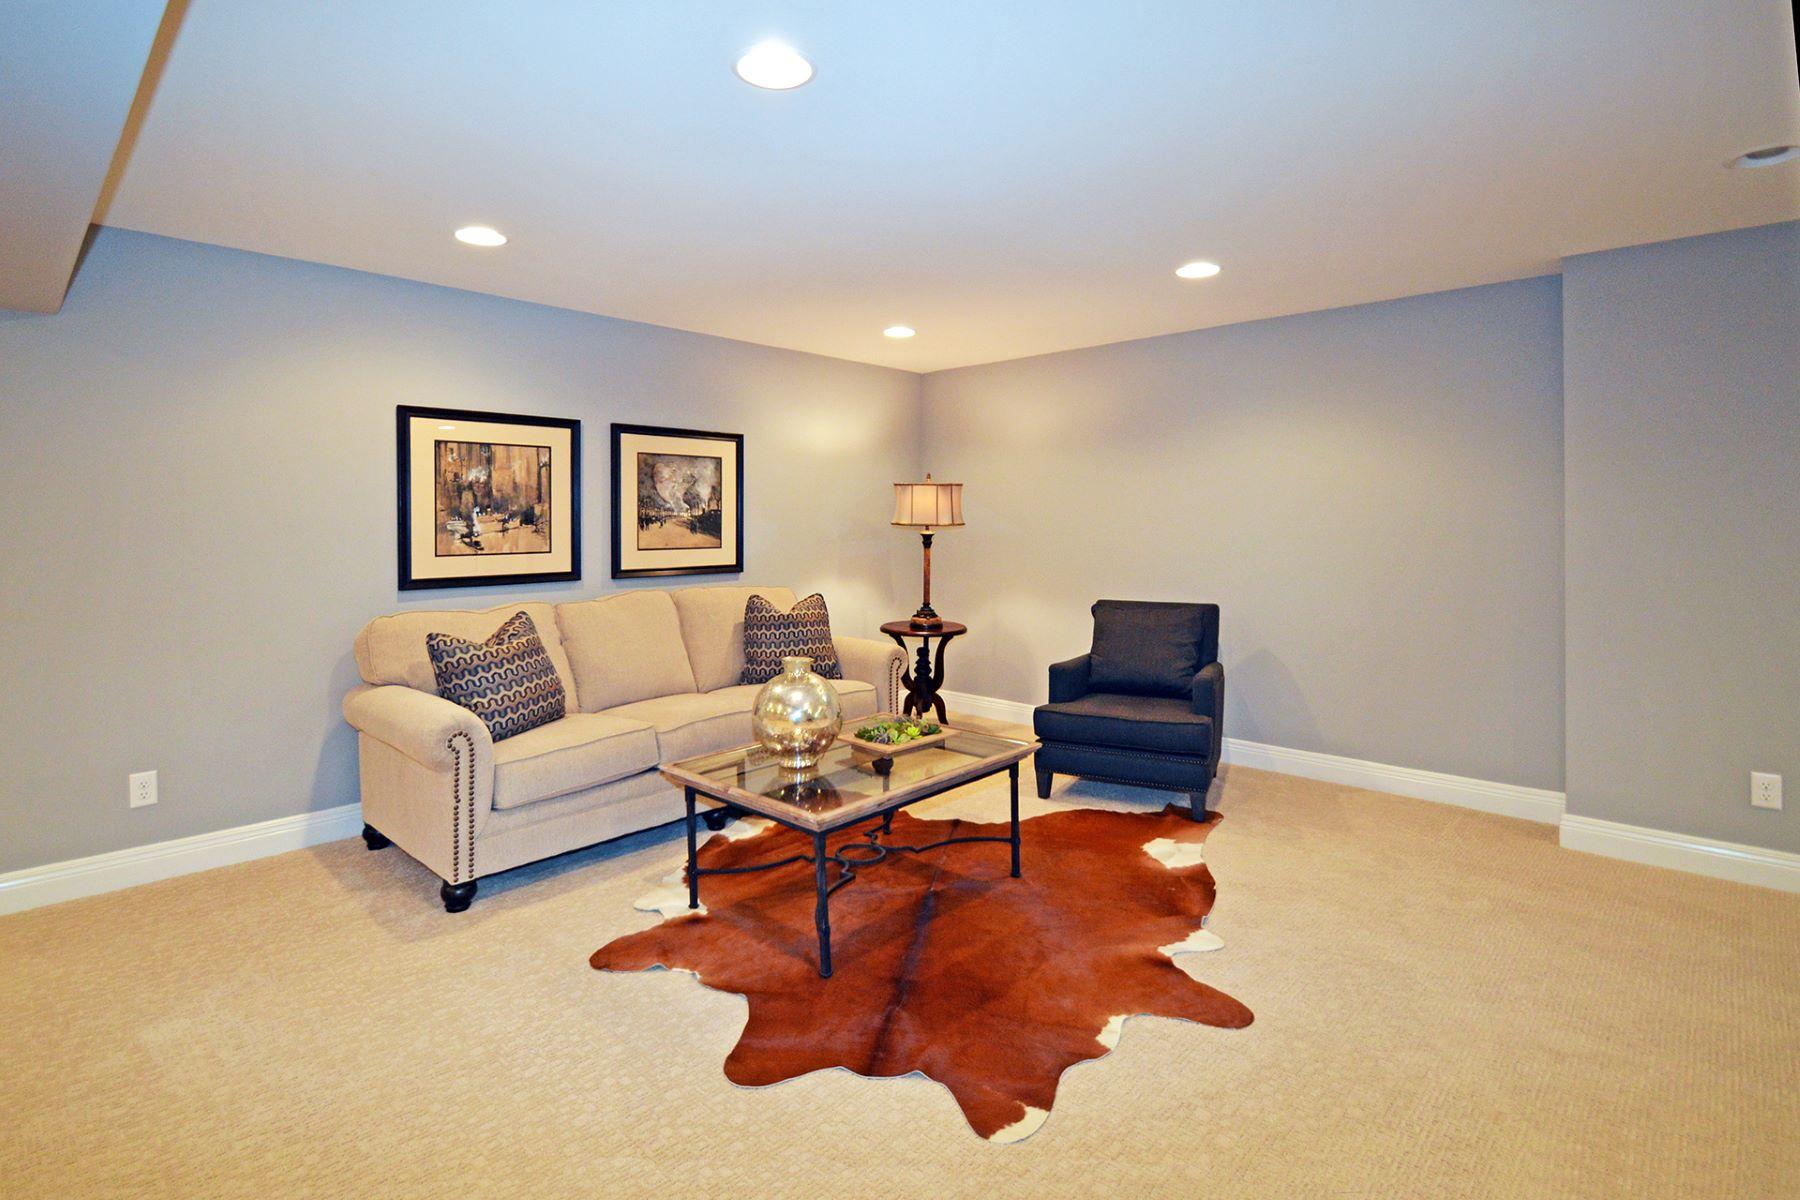 Additional photo for property listing at Creekside Pointe 4024 Creekside Poine 9415 Plainfield Rd Cincinnati, Ohio 45236 Estados Unidos